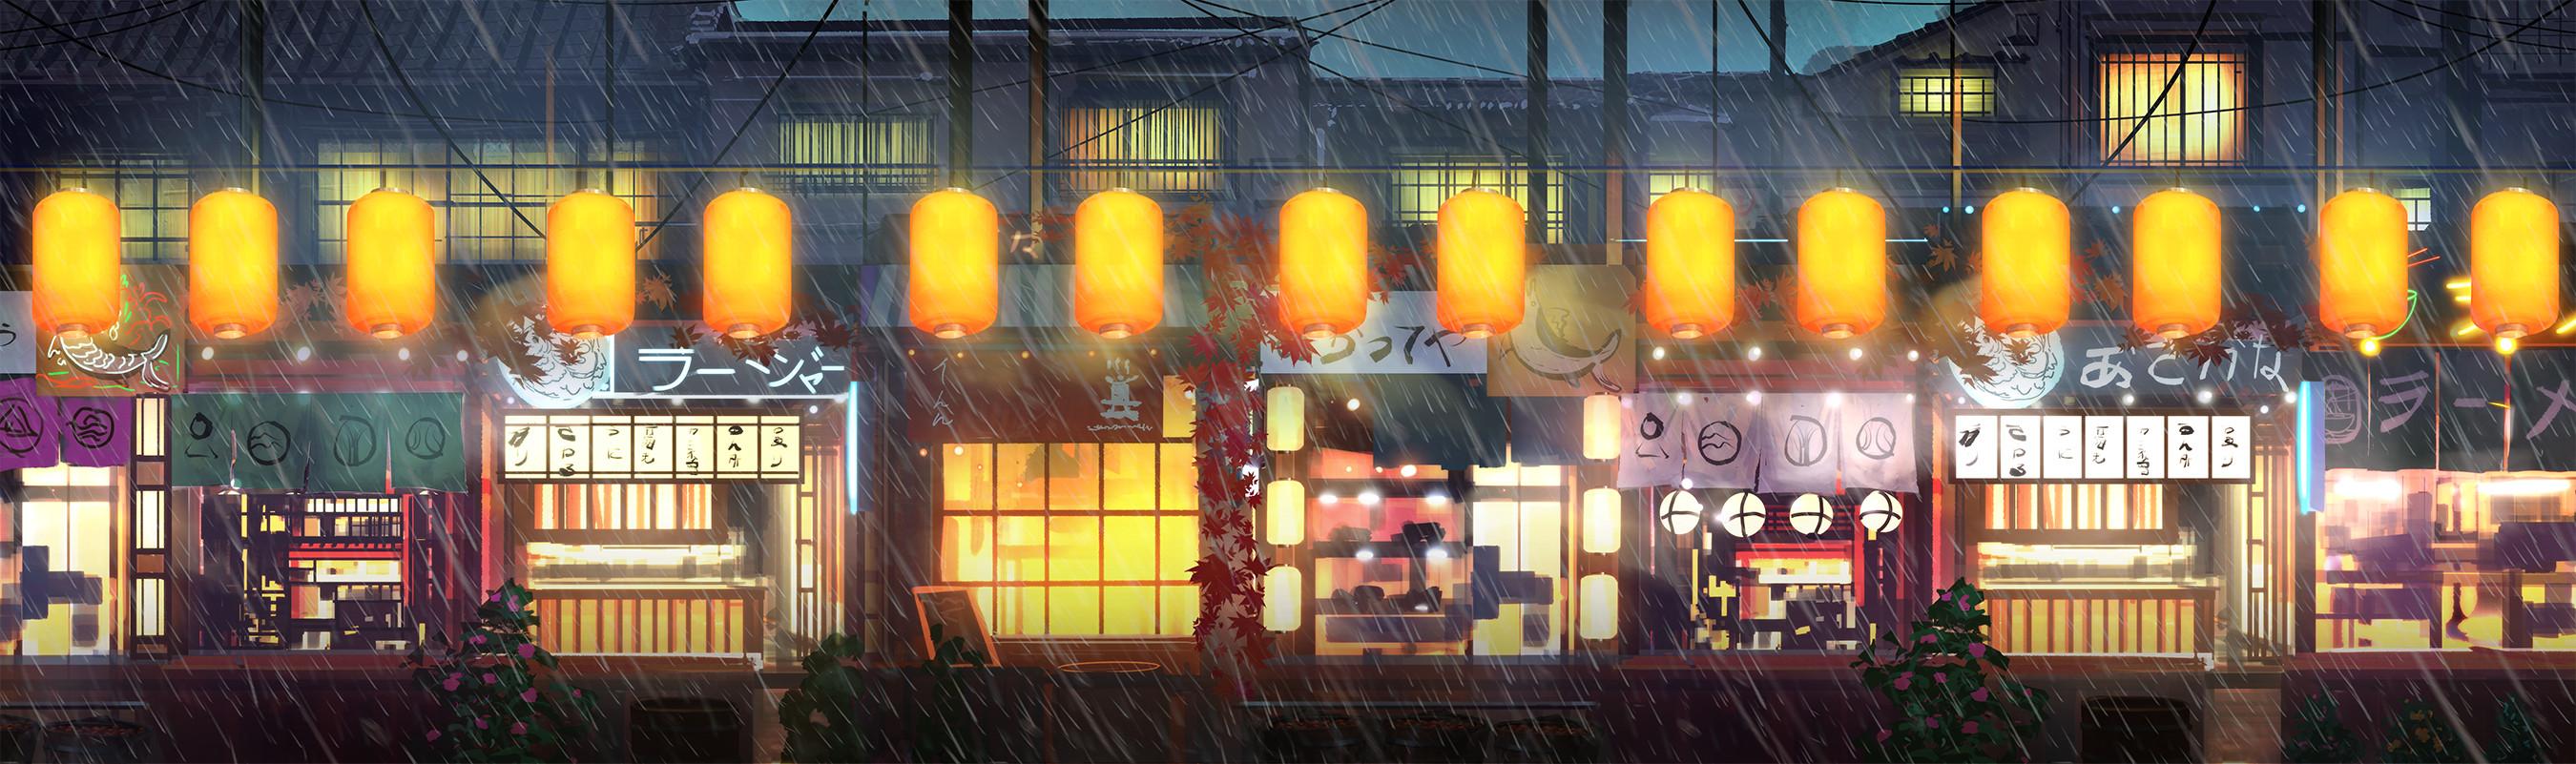 Japanese Market: side shot